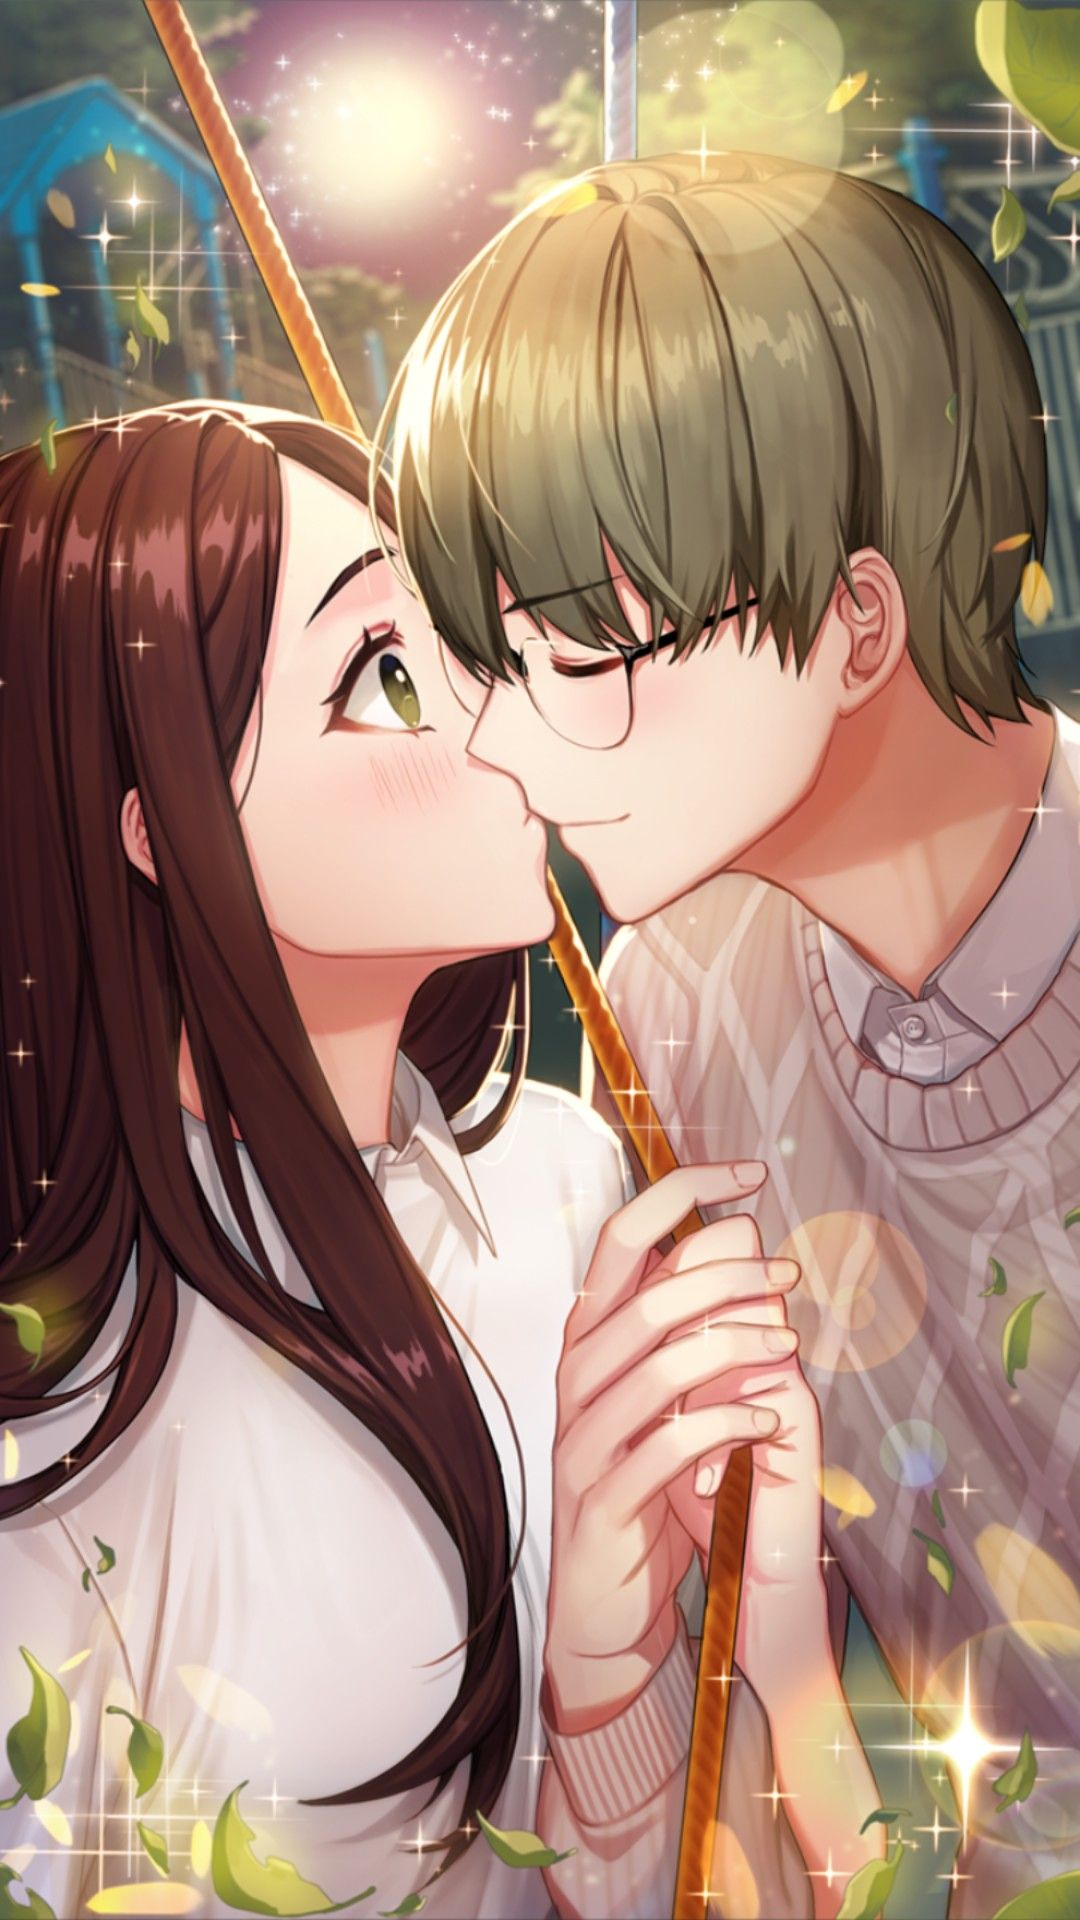 Otome Game Loved By King Bs Erick Blanche Happy Ending Webtoon Gambar Gambar Anime